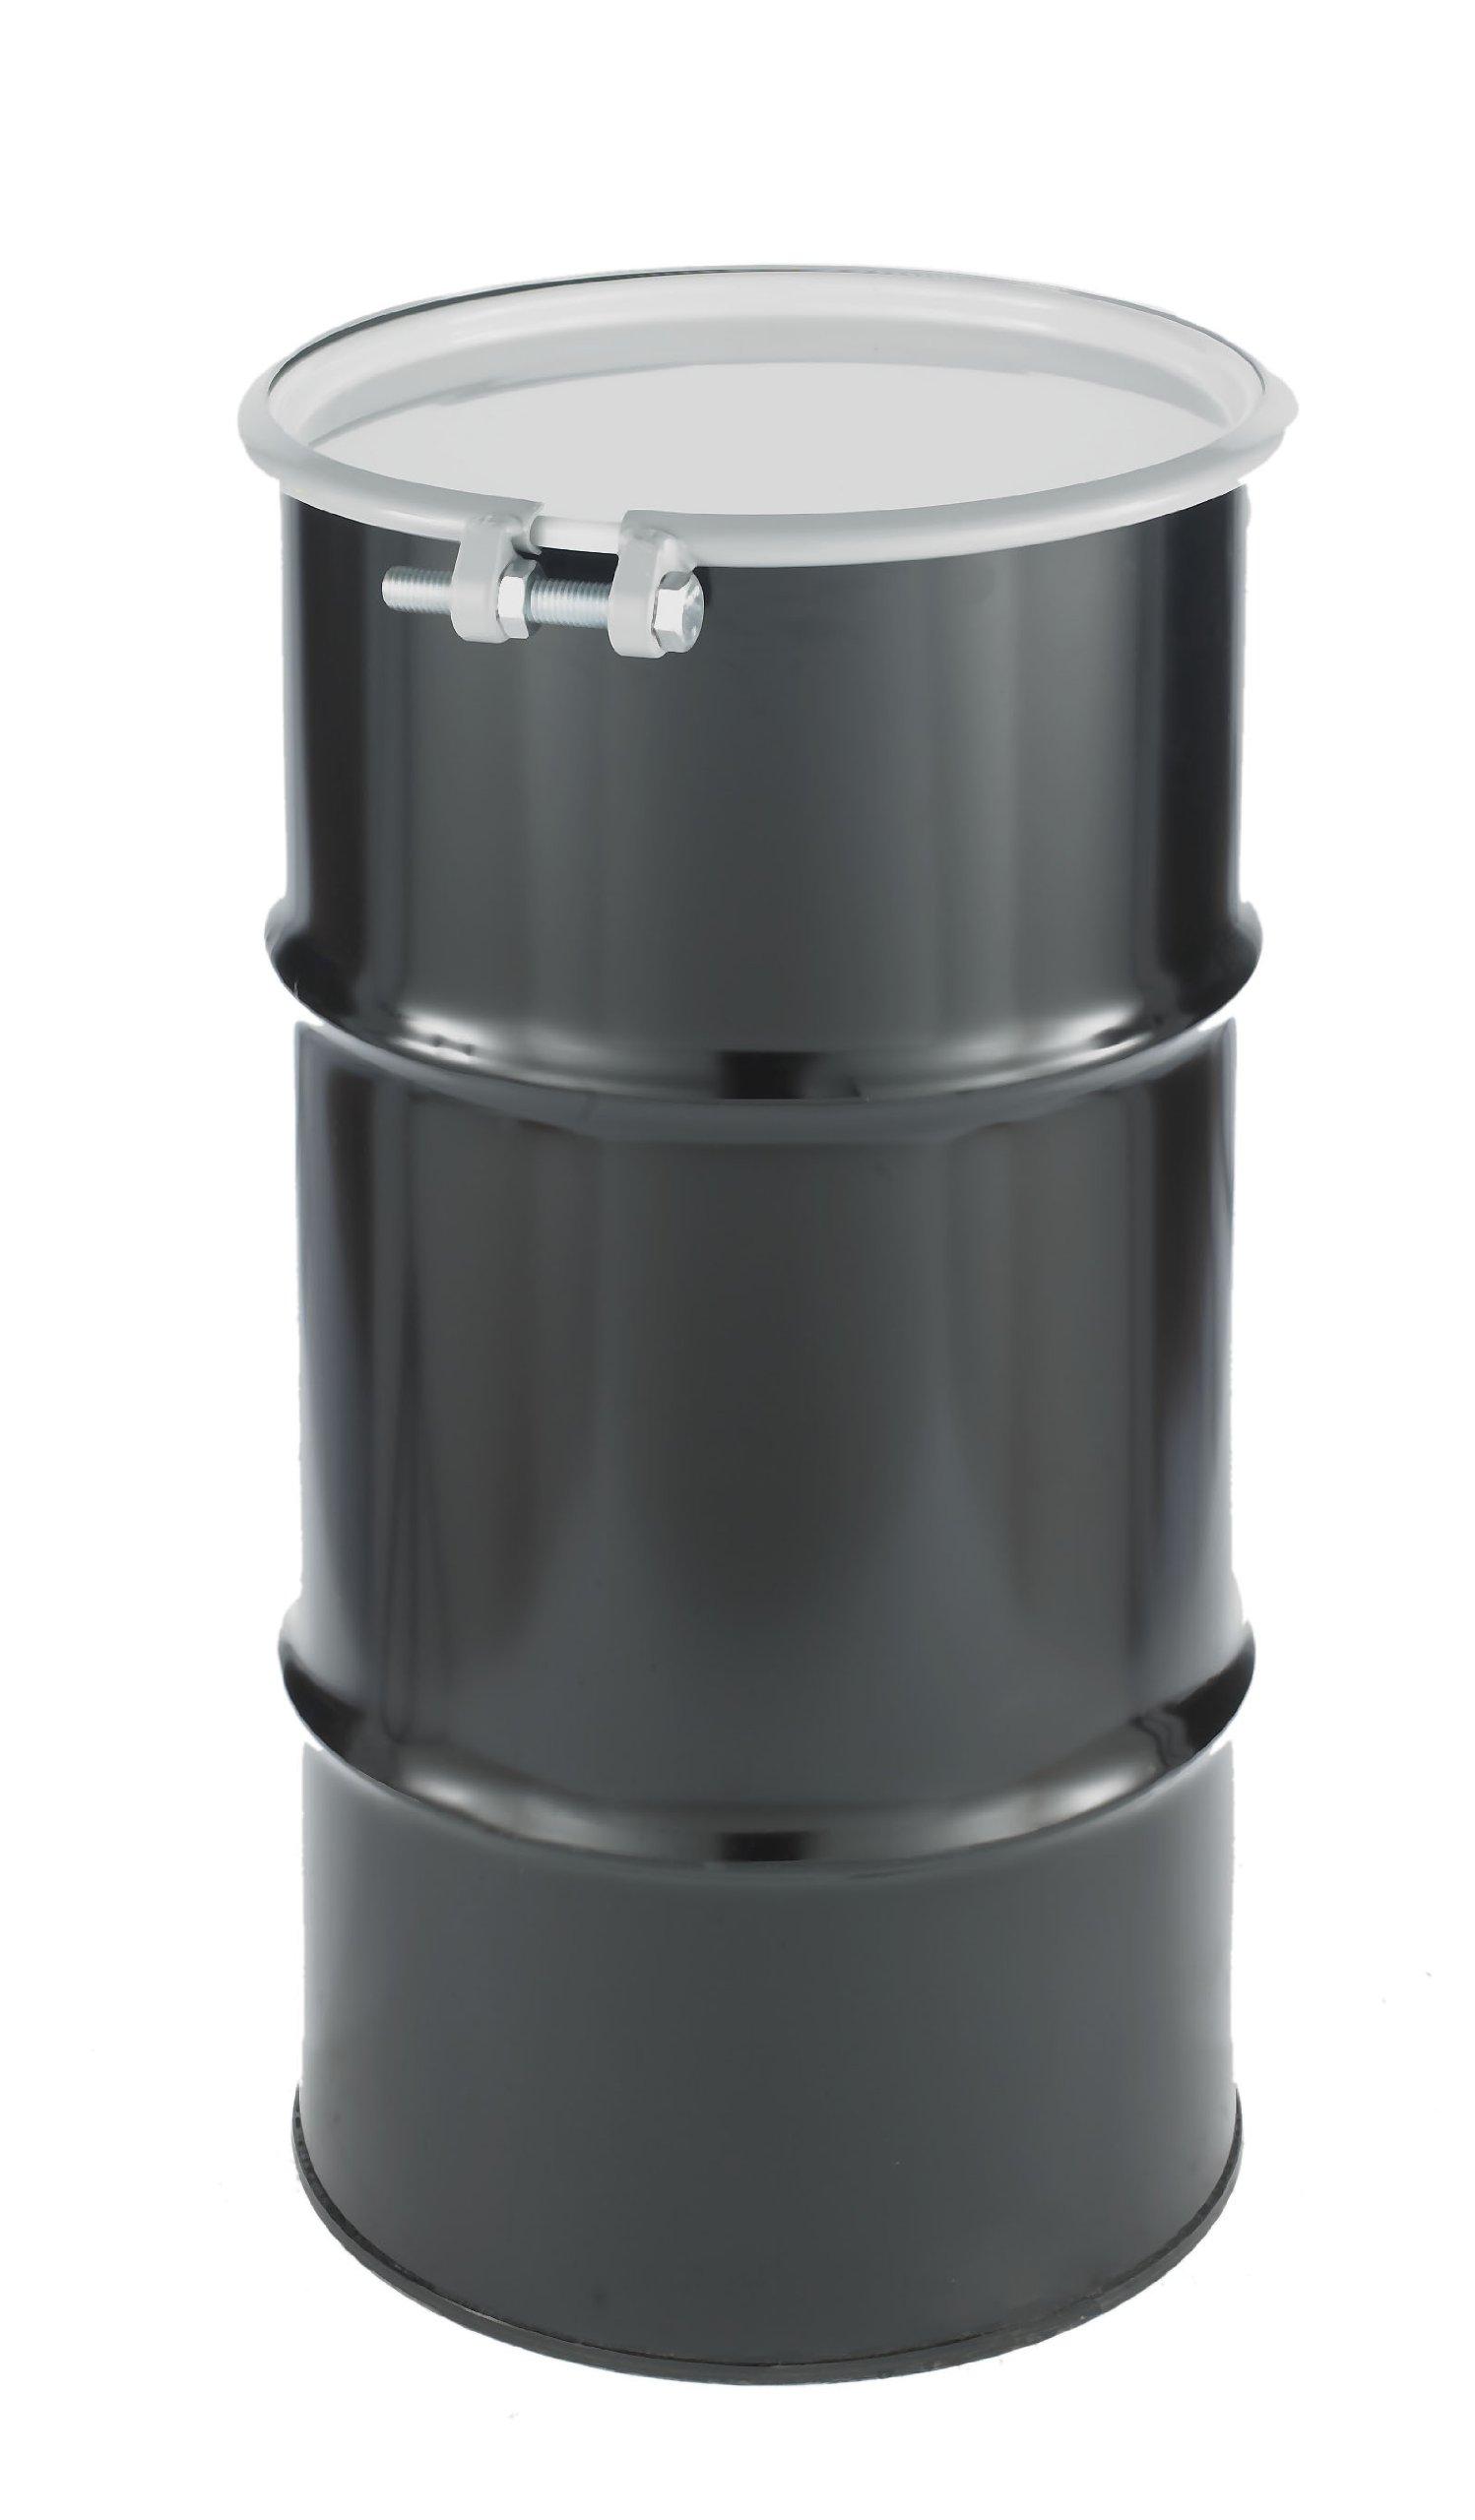 SKOLNIK Carbon Steel Open Head Drum, 16 gallons, Bolt Ring, 0.9mm Body Gauge (Pack of 1)